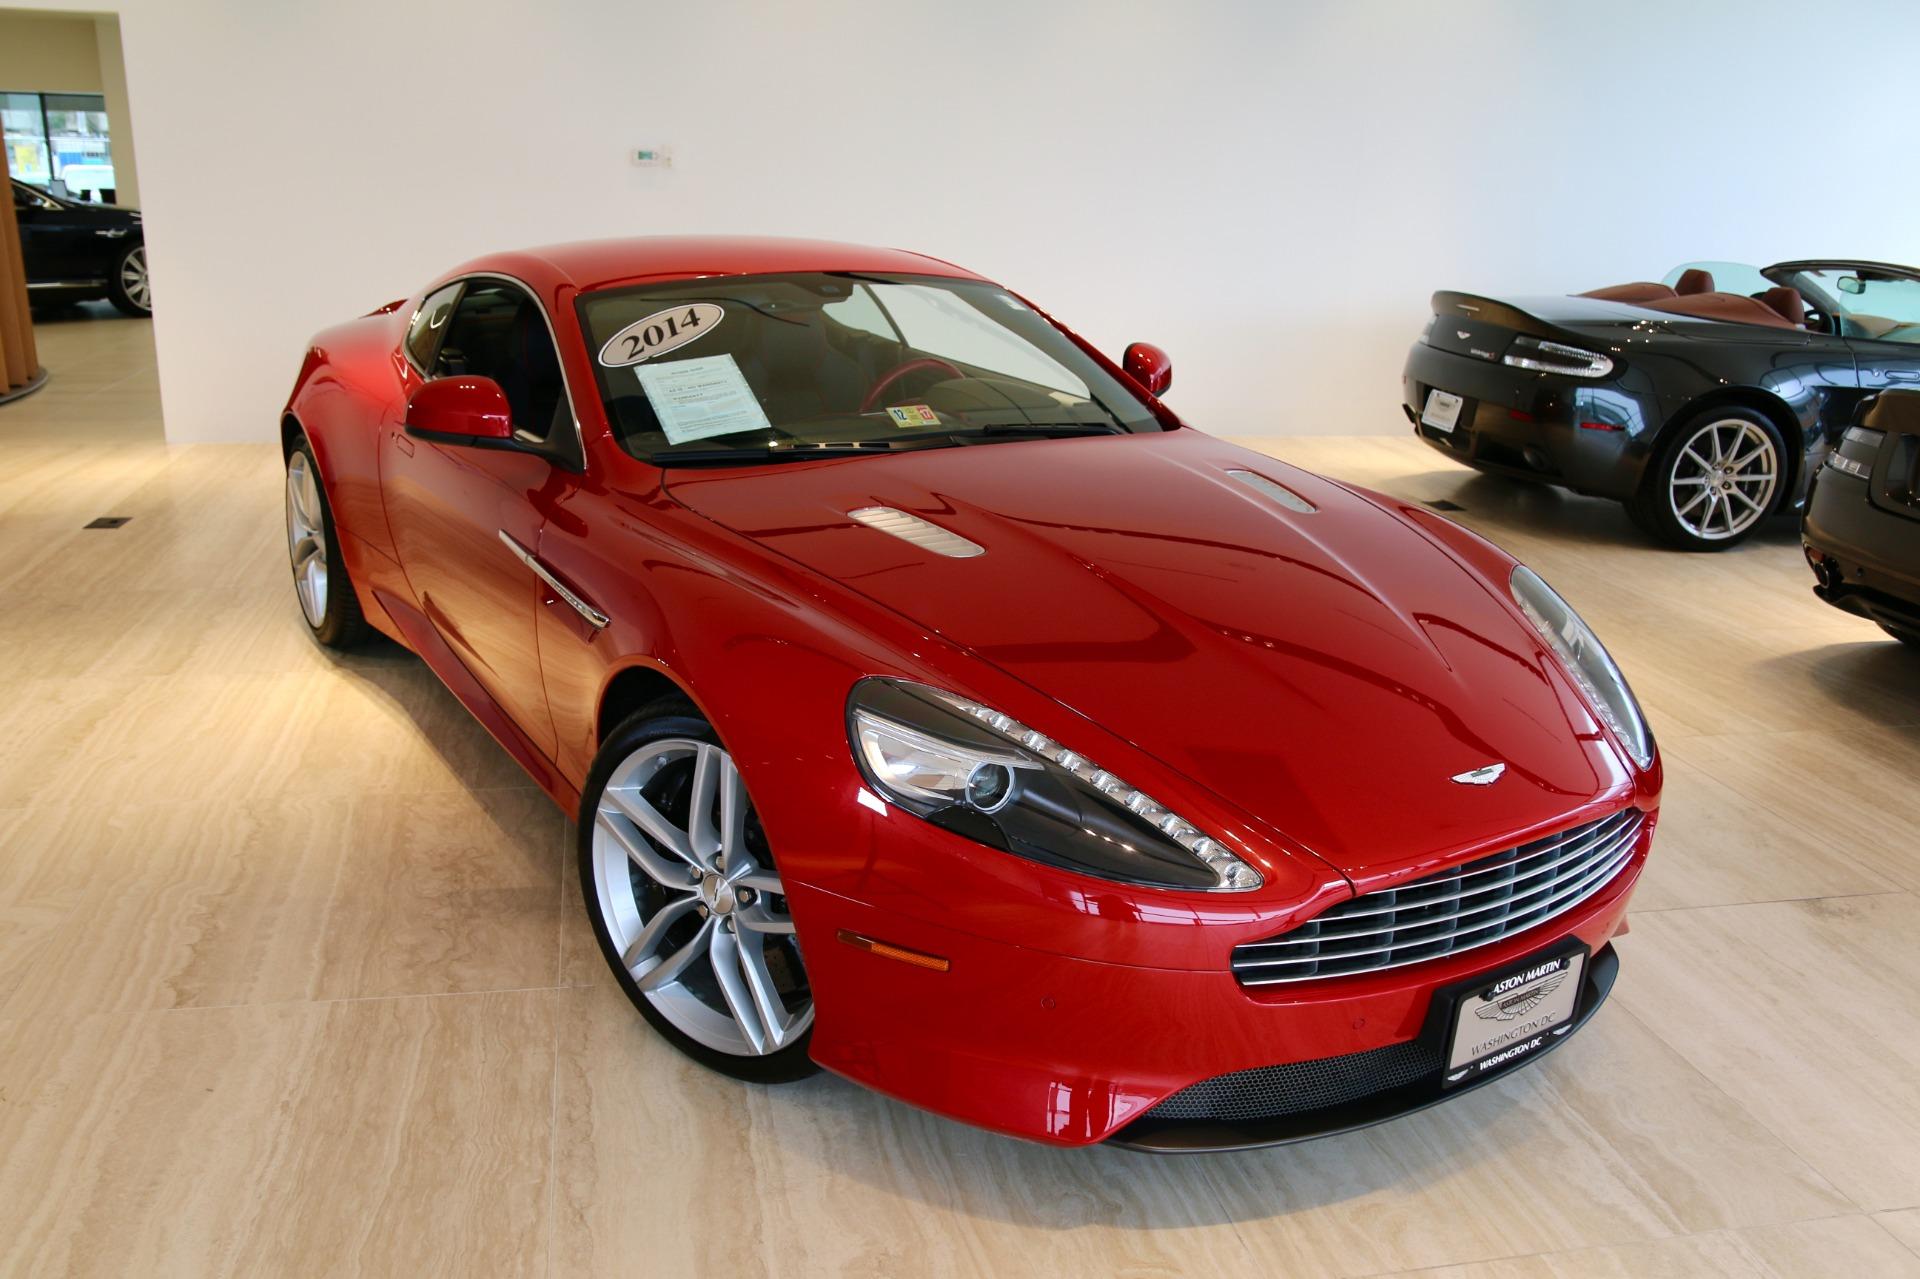 2014 Aston Martin Db9 Stock 6w001065a For Sale Near Vienna Va Va Aston Martin Dealer